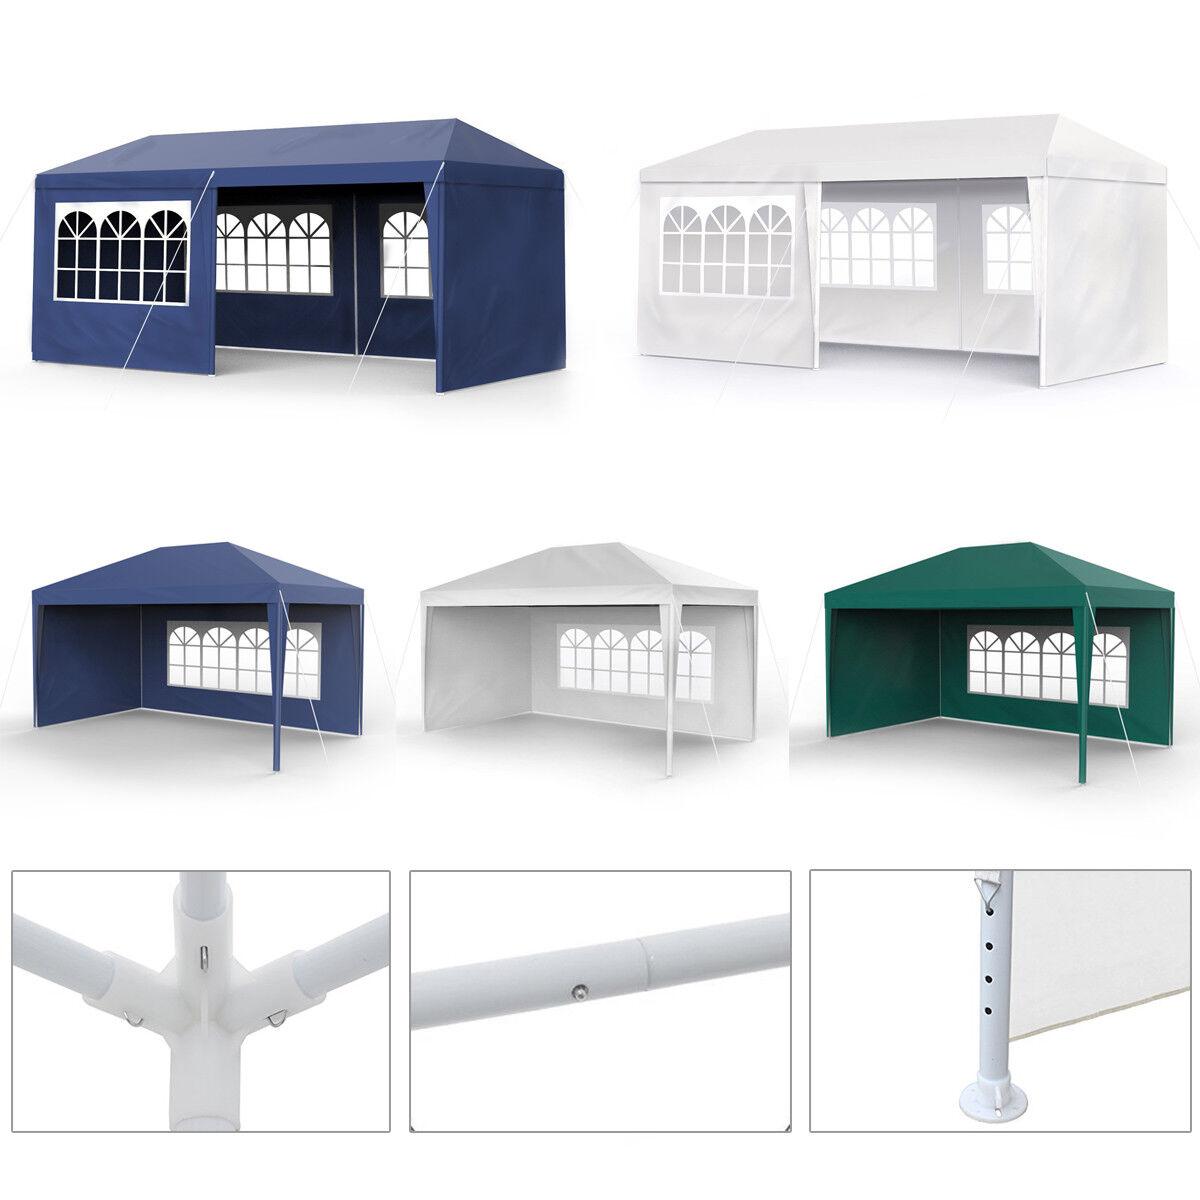 Partyzelt 3x4m 3x6m Festzelt Vereinszelt Gartenzelt Zelt Pavillon Wasserdicht